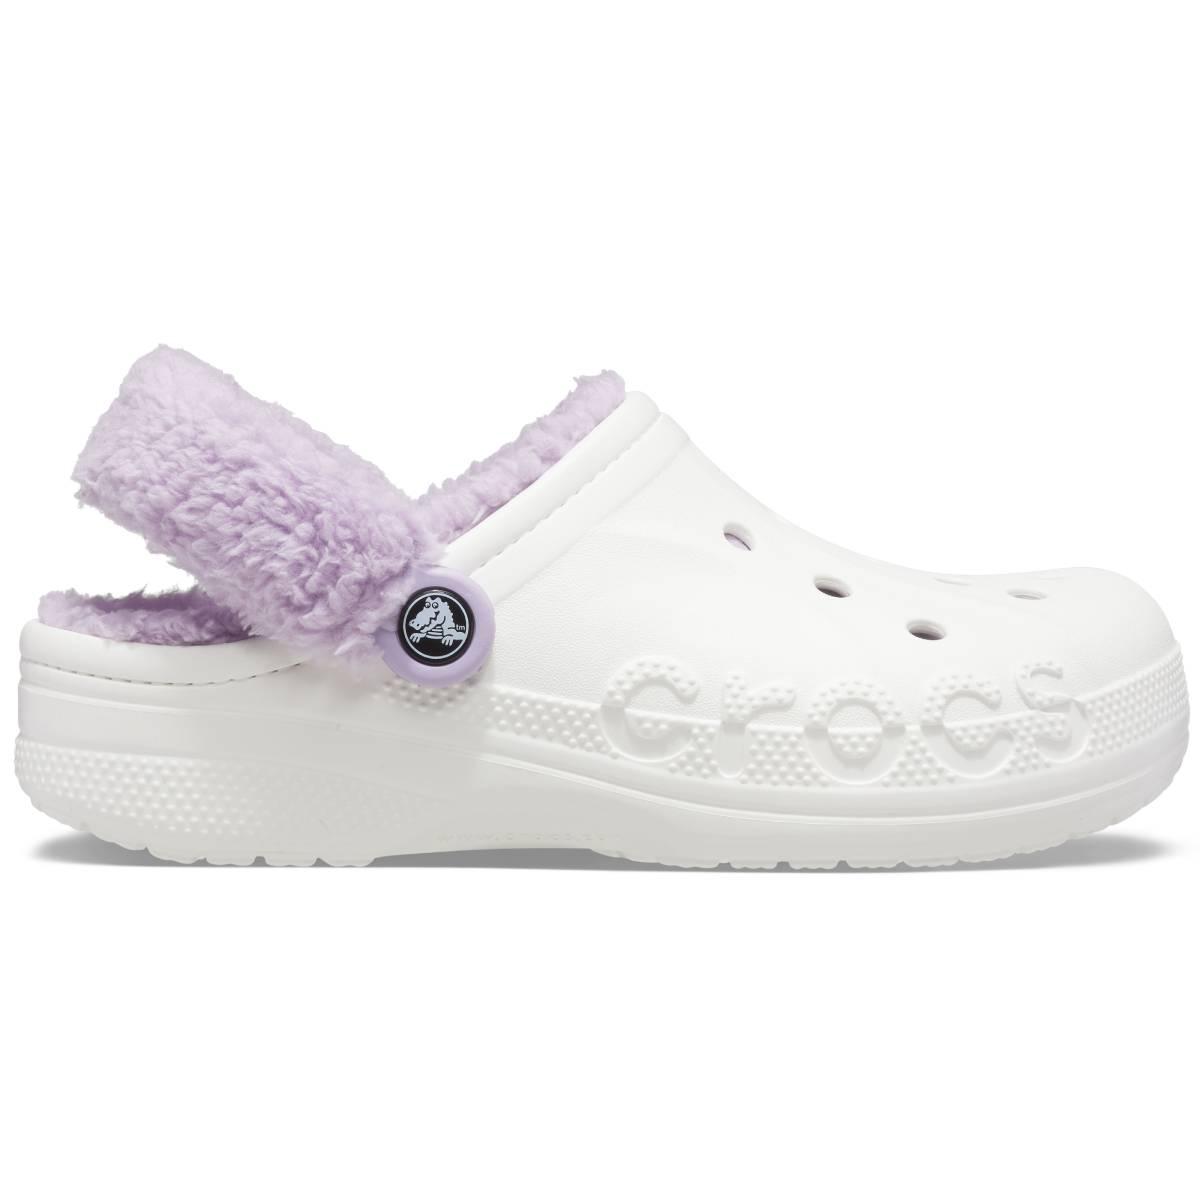 Baya Lined Fuzz Strap Clog - White/Lavender